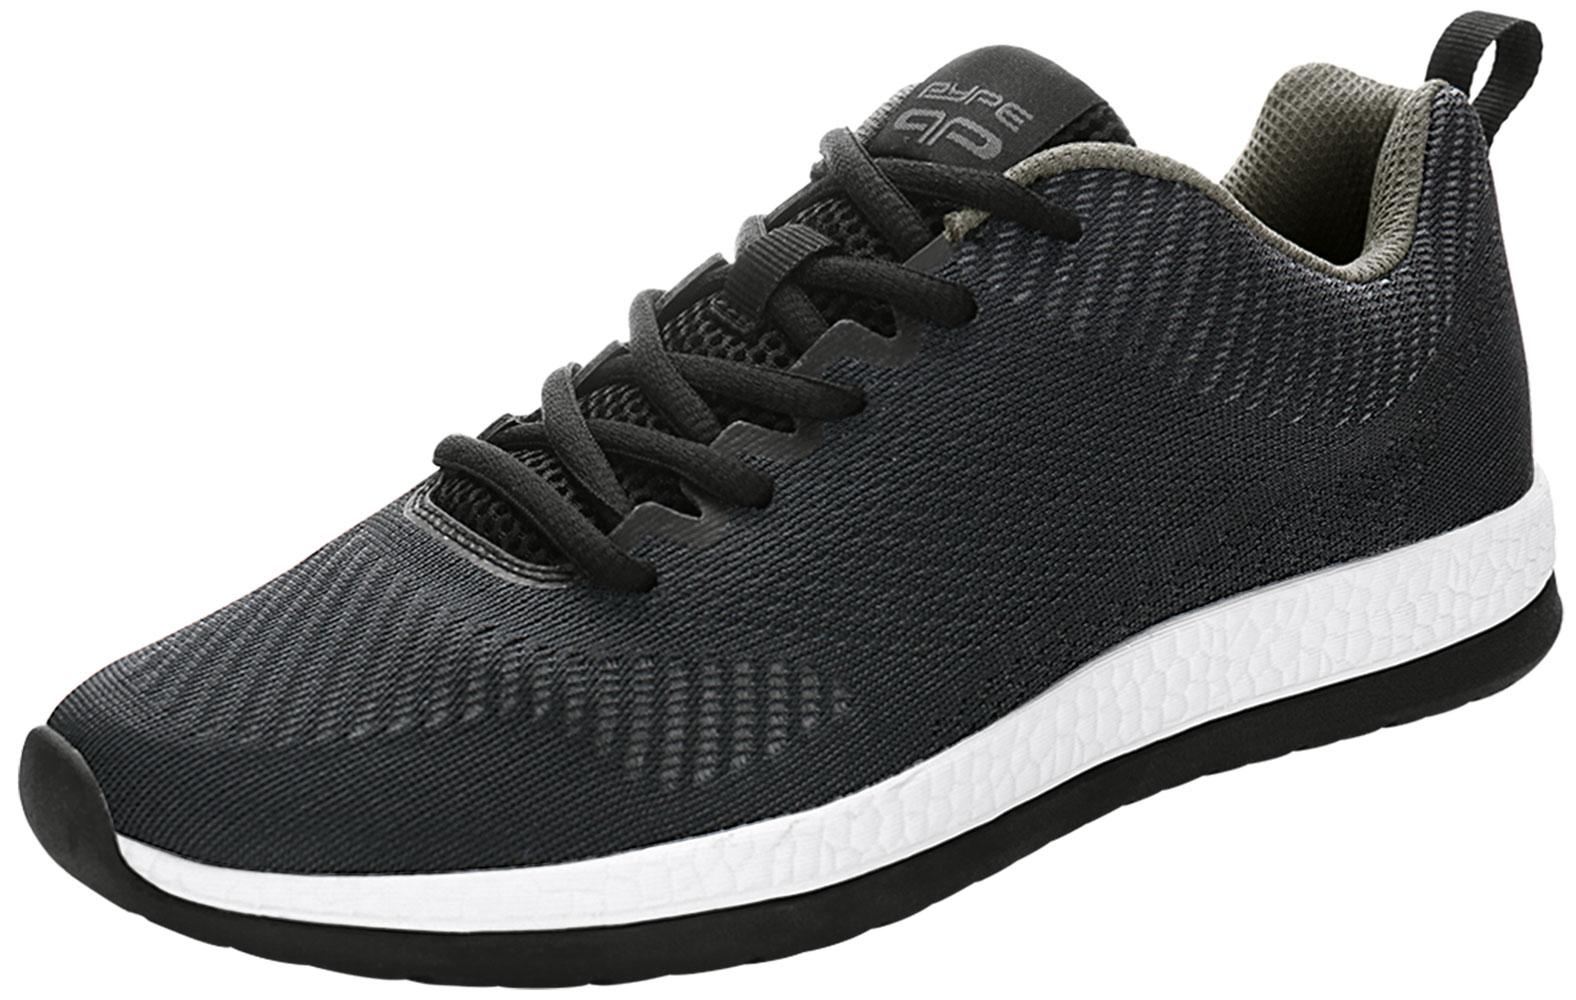 PYPE Women Mesh Contrast Color Round Toe Training Sneakers Black US 8